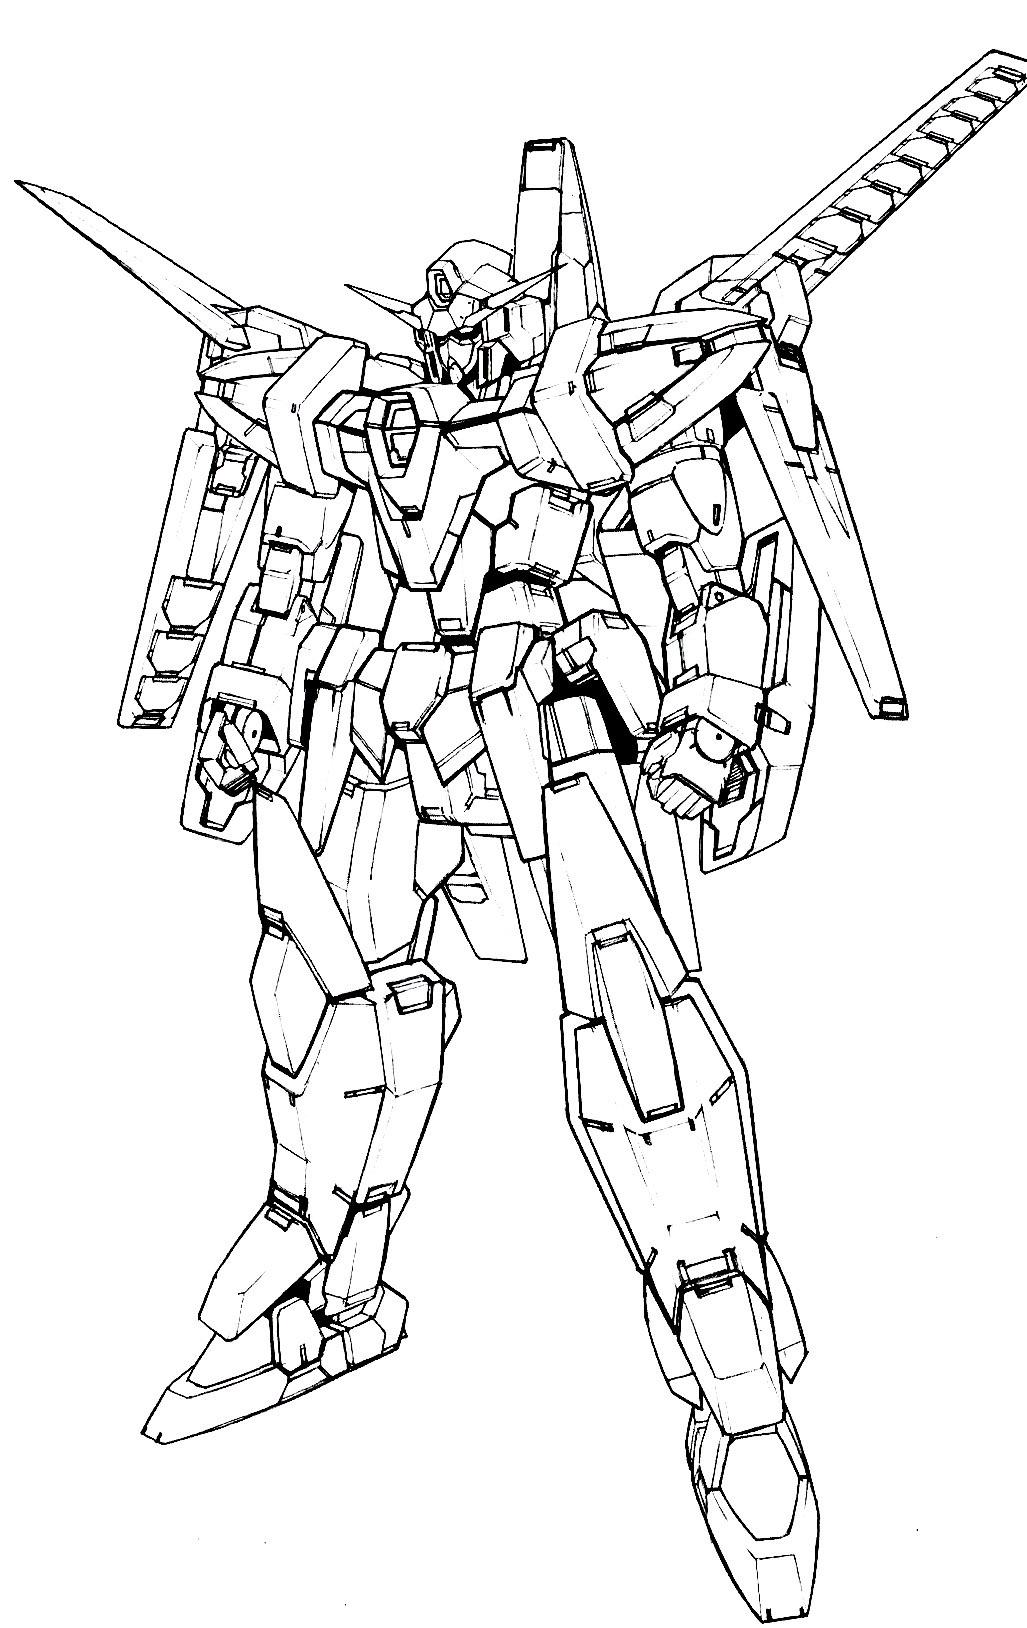 Gundam Coloring Pages : gundam, coloring, pages, Gundam, Coloring, Pages